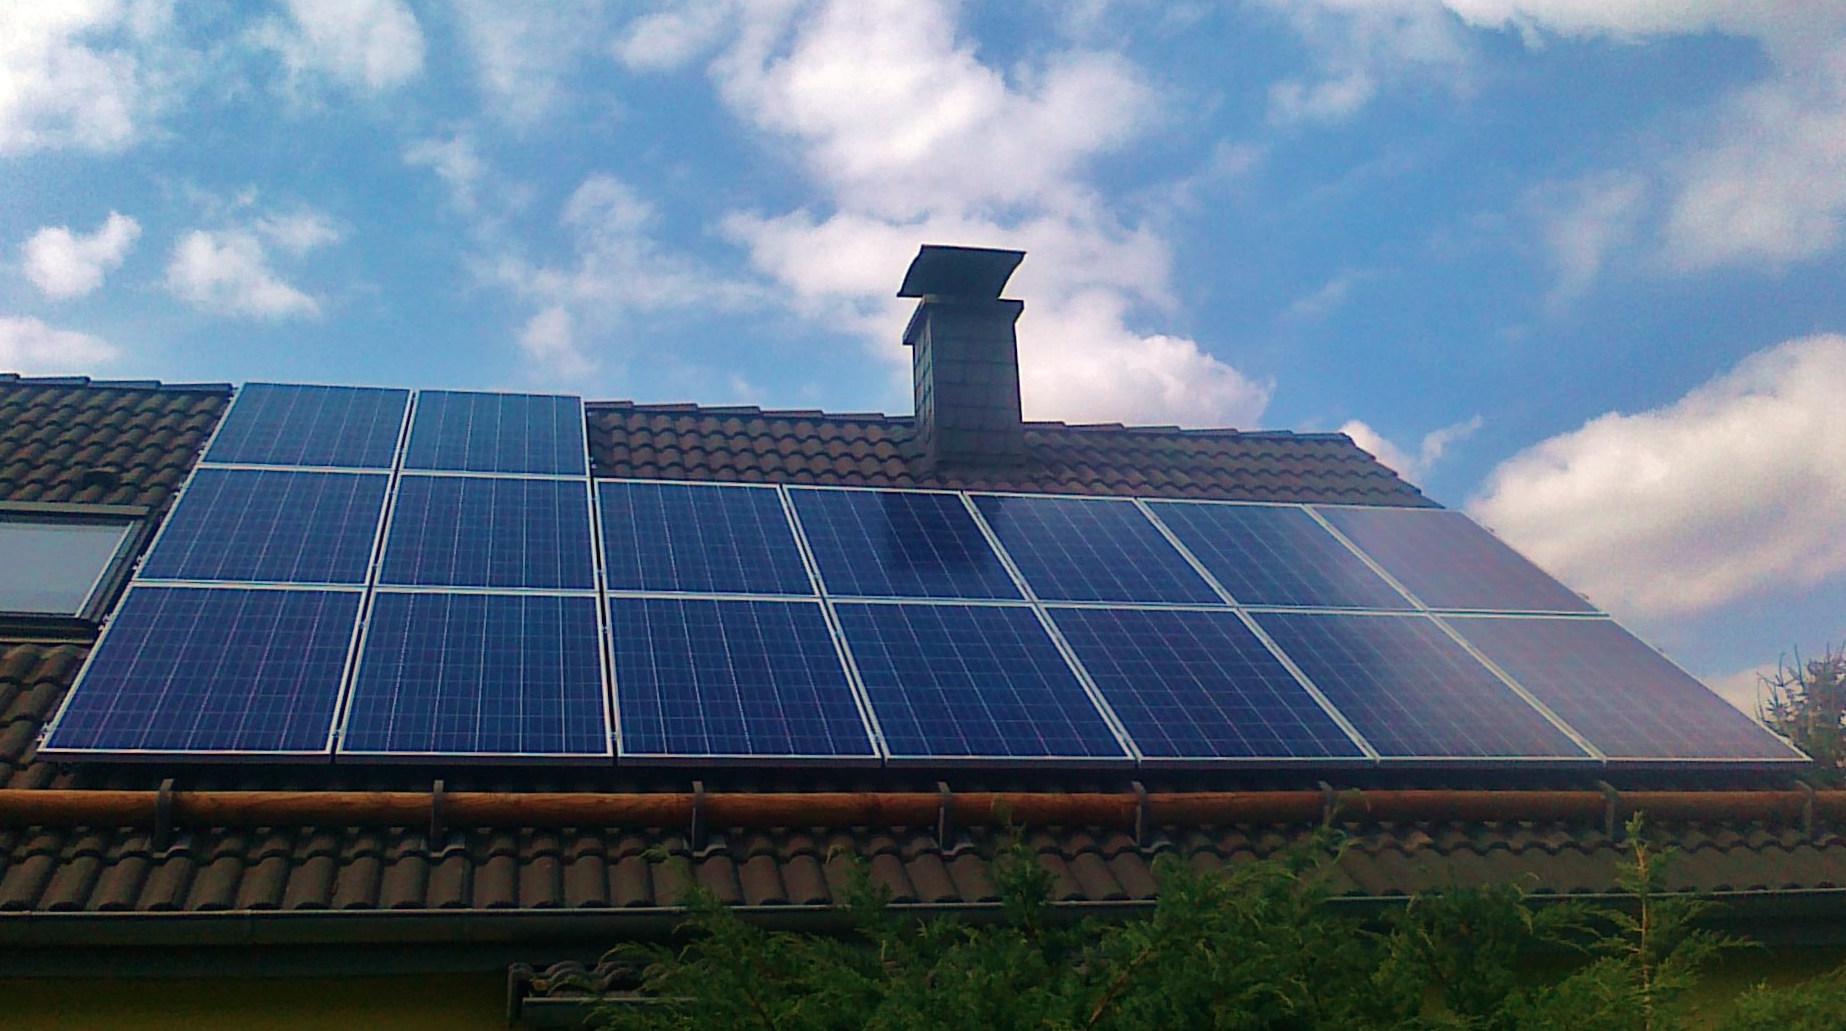 PV-Solaranlage Photovoltaik 04651 Bad Lausick 4kWp